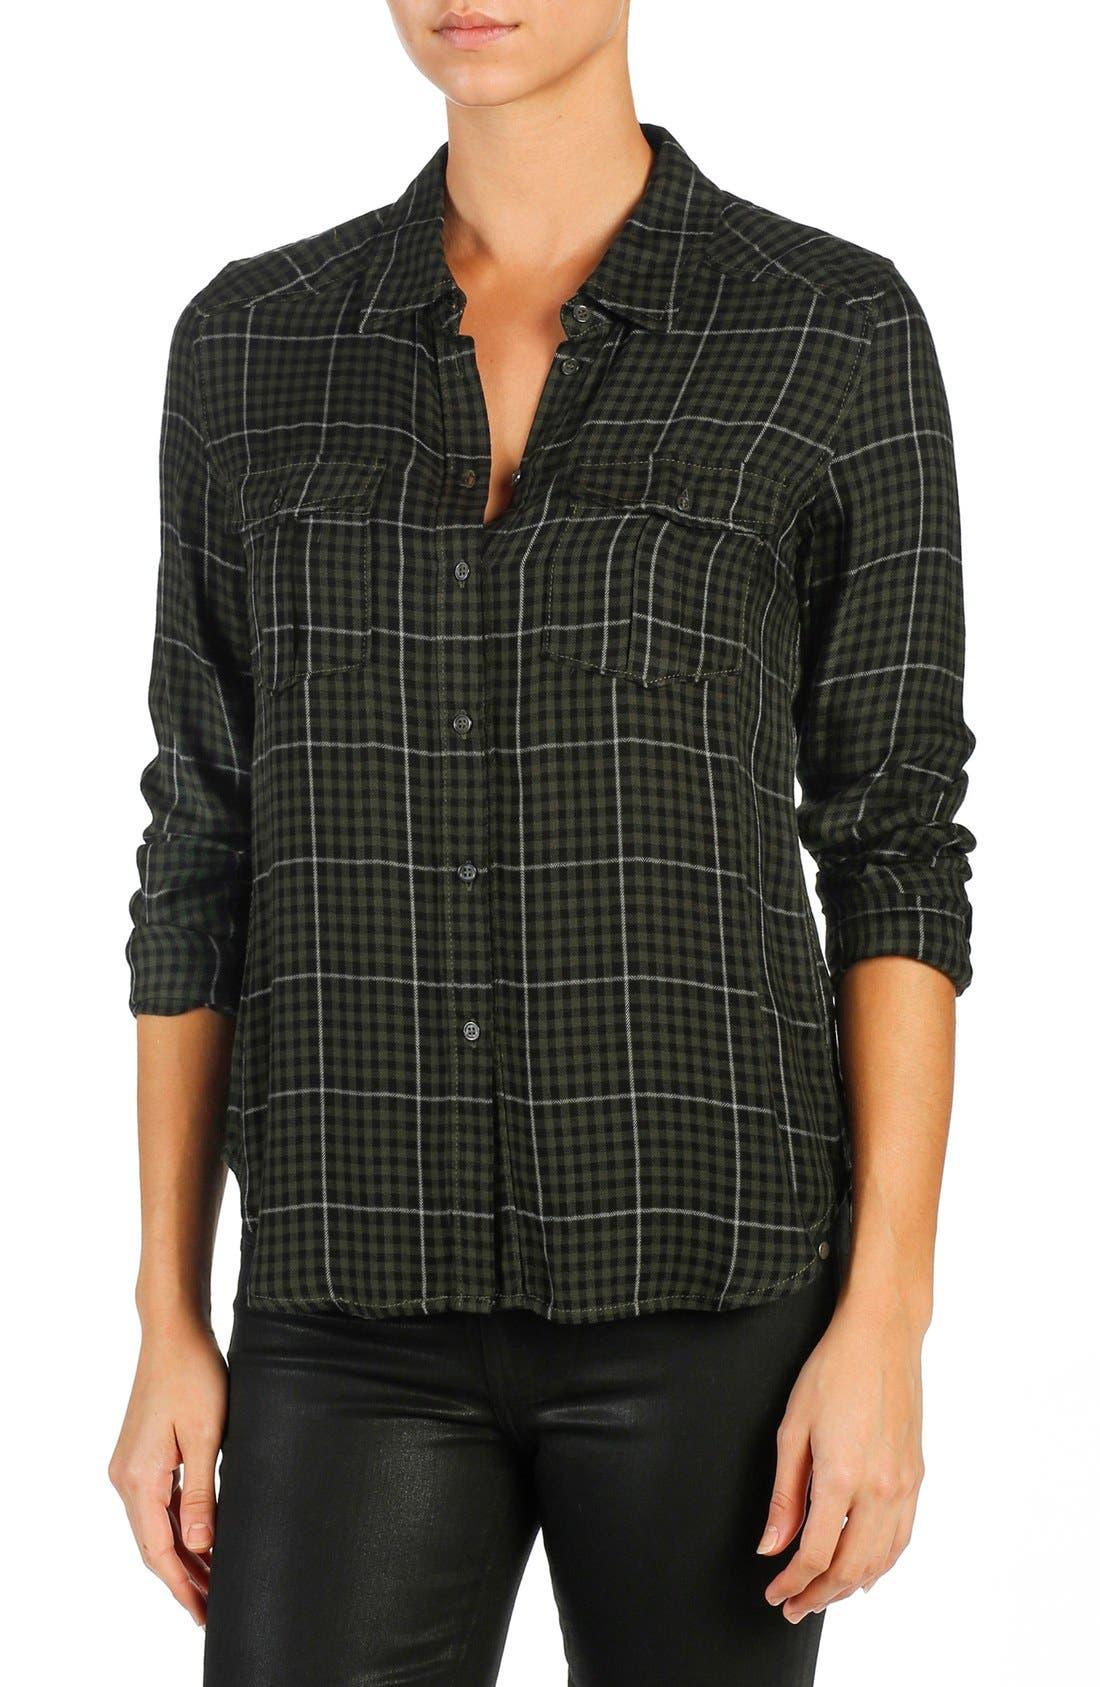 Alternate Image 1 Selected - PAIGE 'Mya' Plaid Shirt